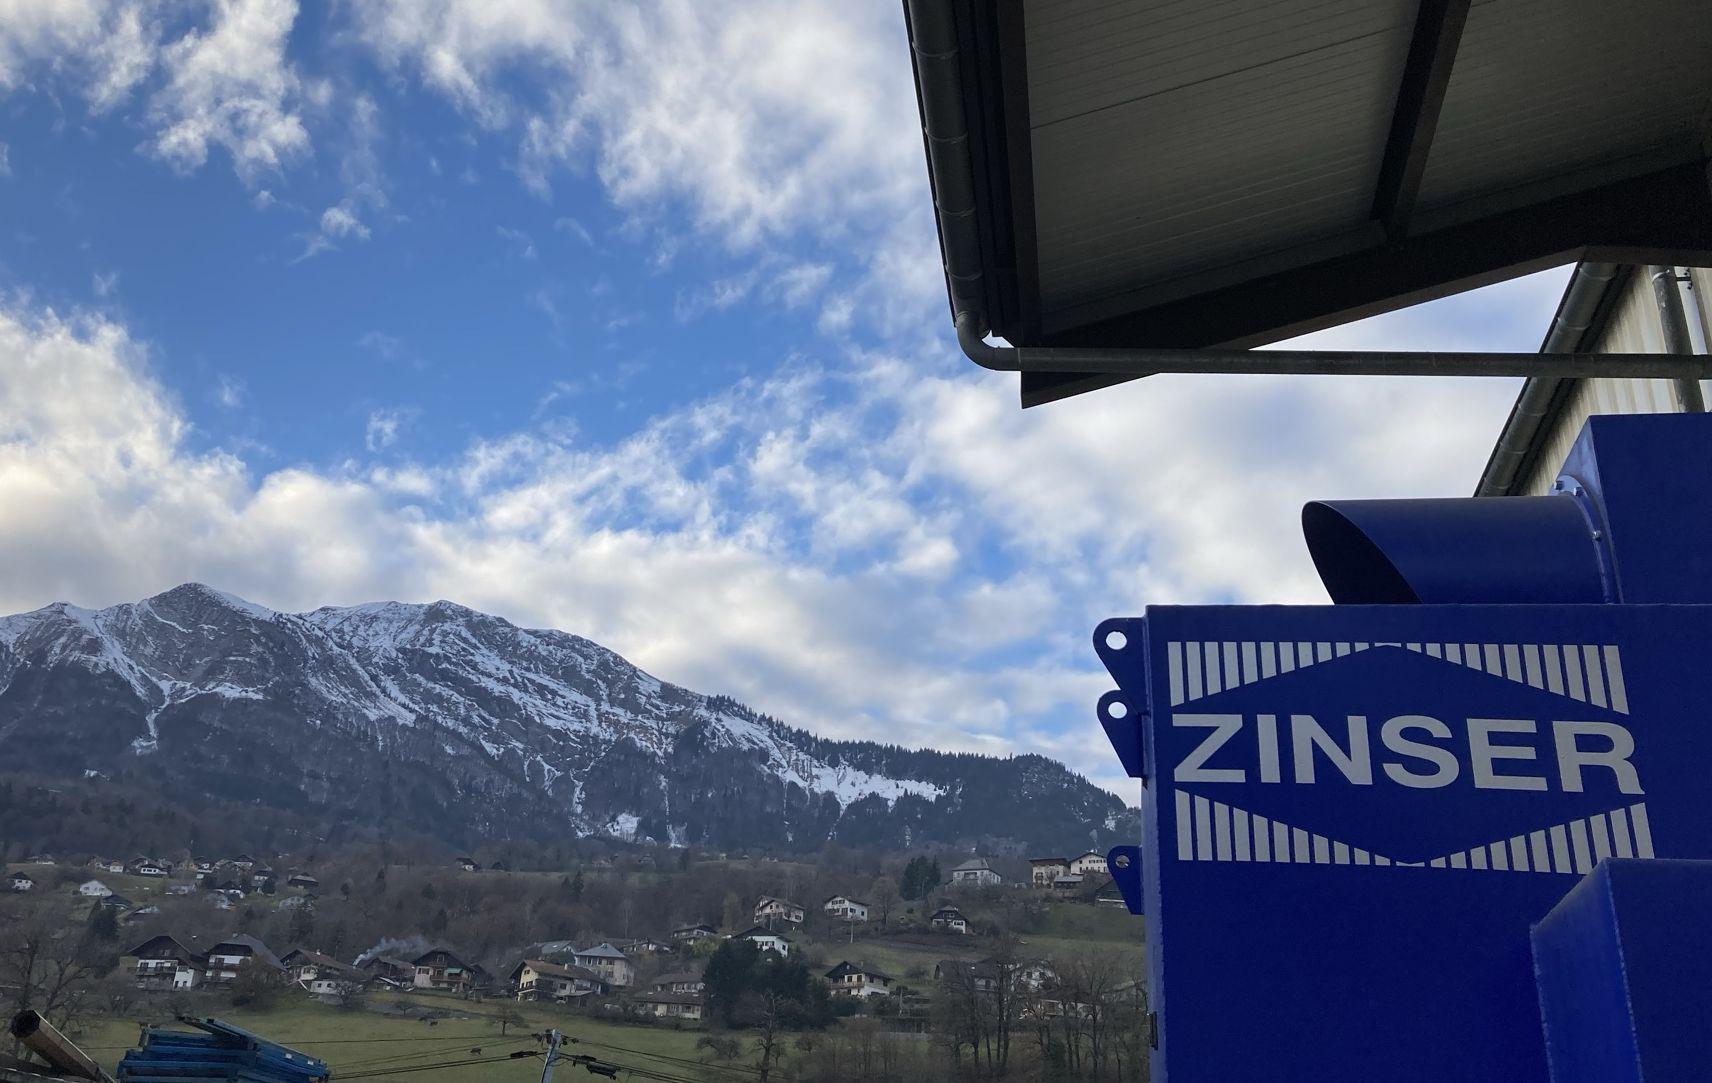 ZINSER en Savoie, Albertville